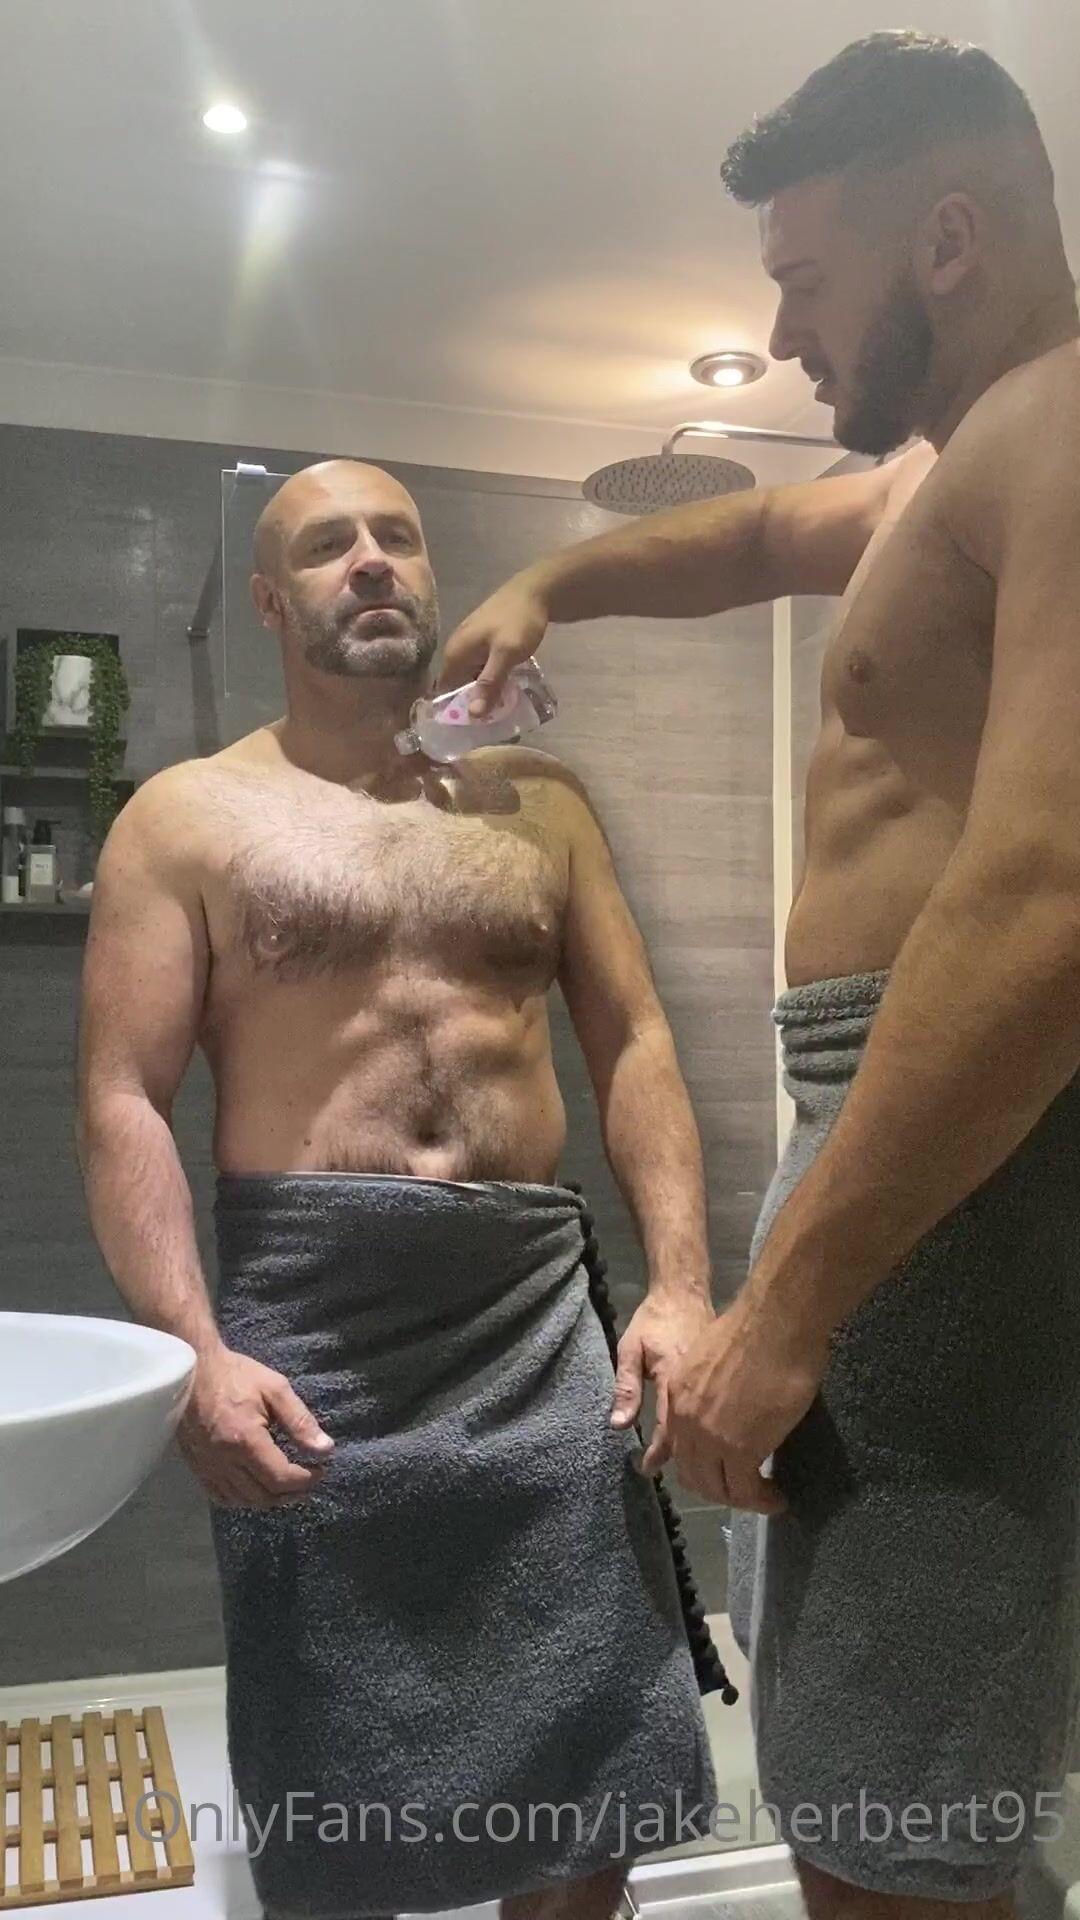 jakeherbert95 free porn videos (55)